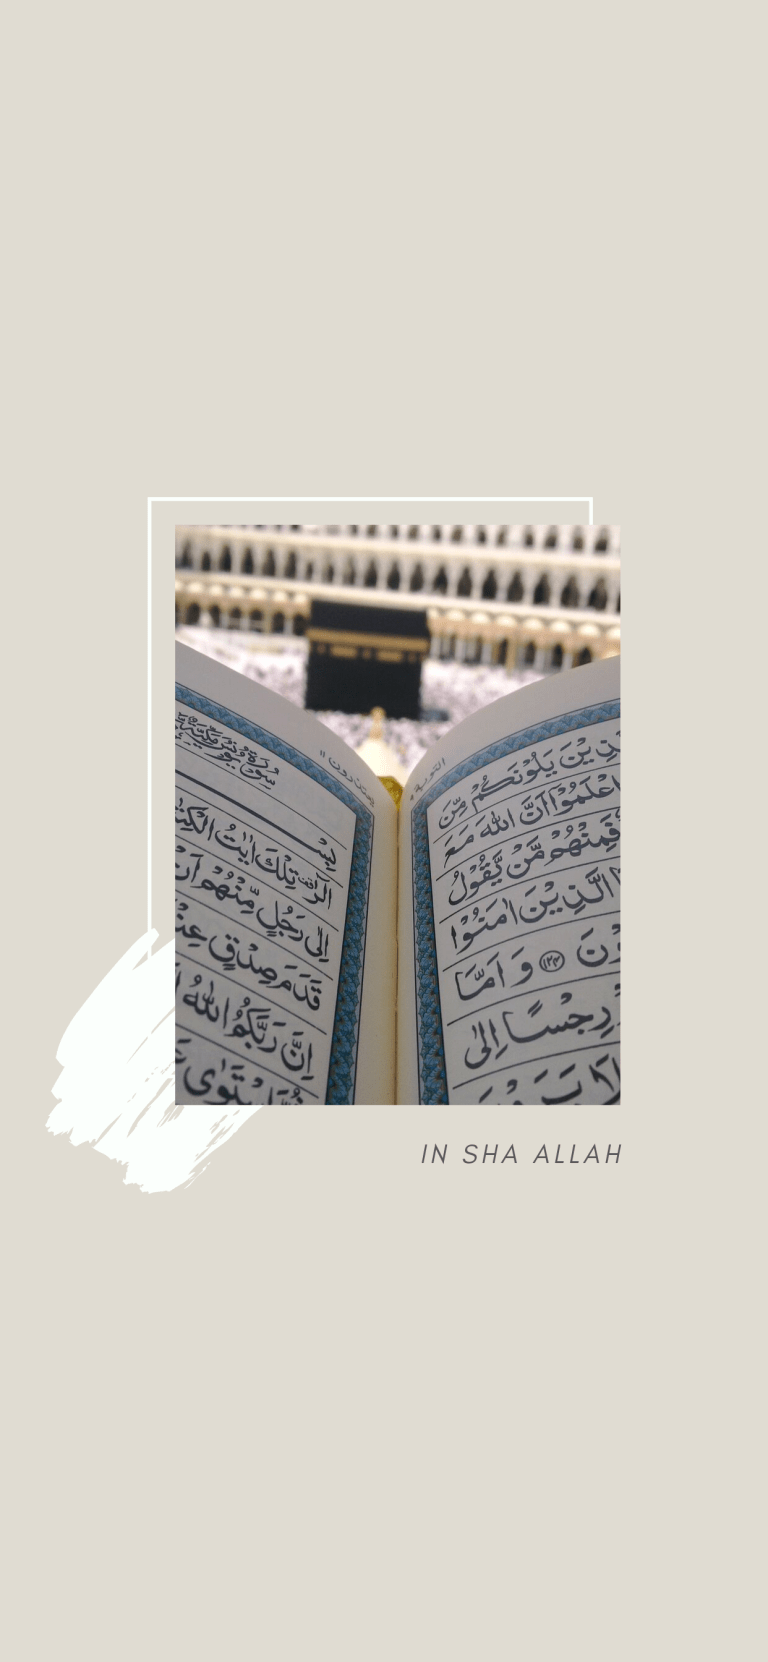 12 Iman Boosting Islamic Phone Wallpapers To Download Free Katie To Khadijah Islamic Wallpaper Iphone Islamic Wallpaper Hd Mecca Wallpaper